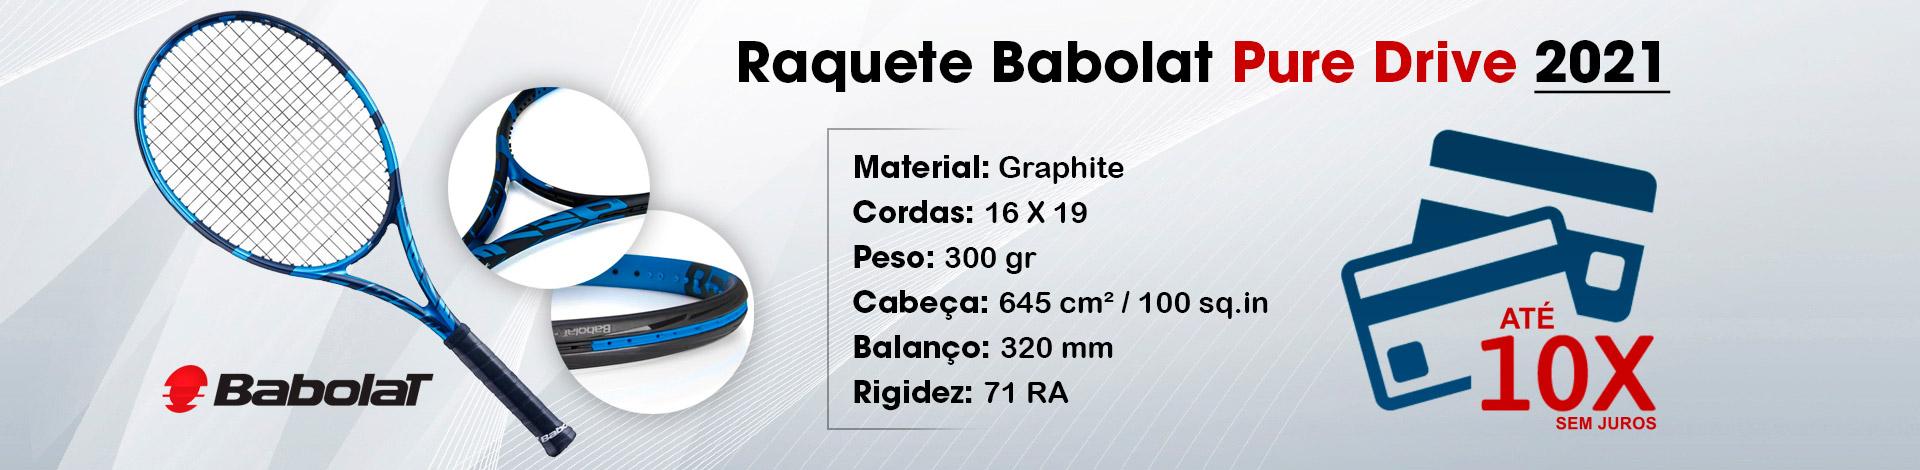 raquetes performance